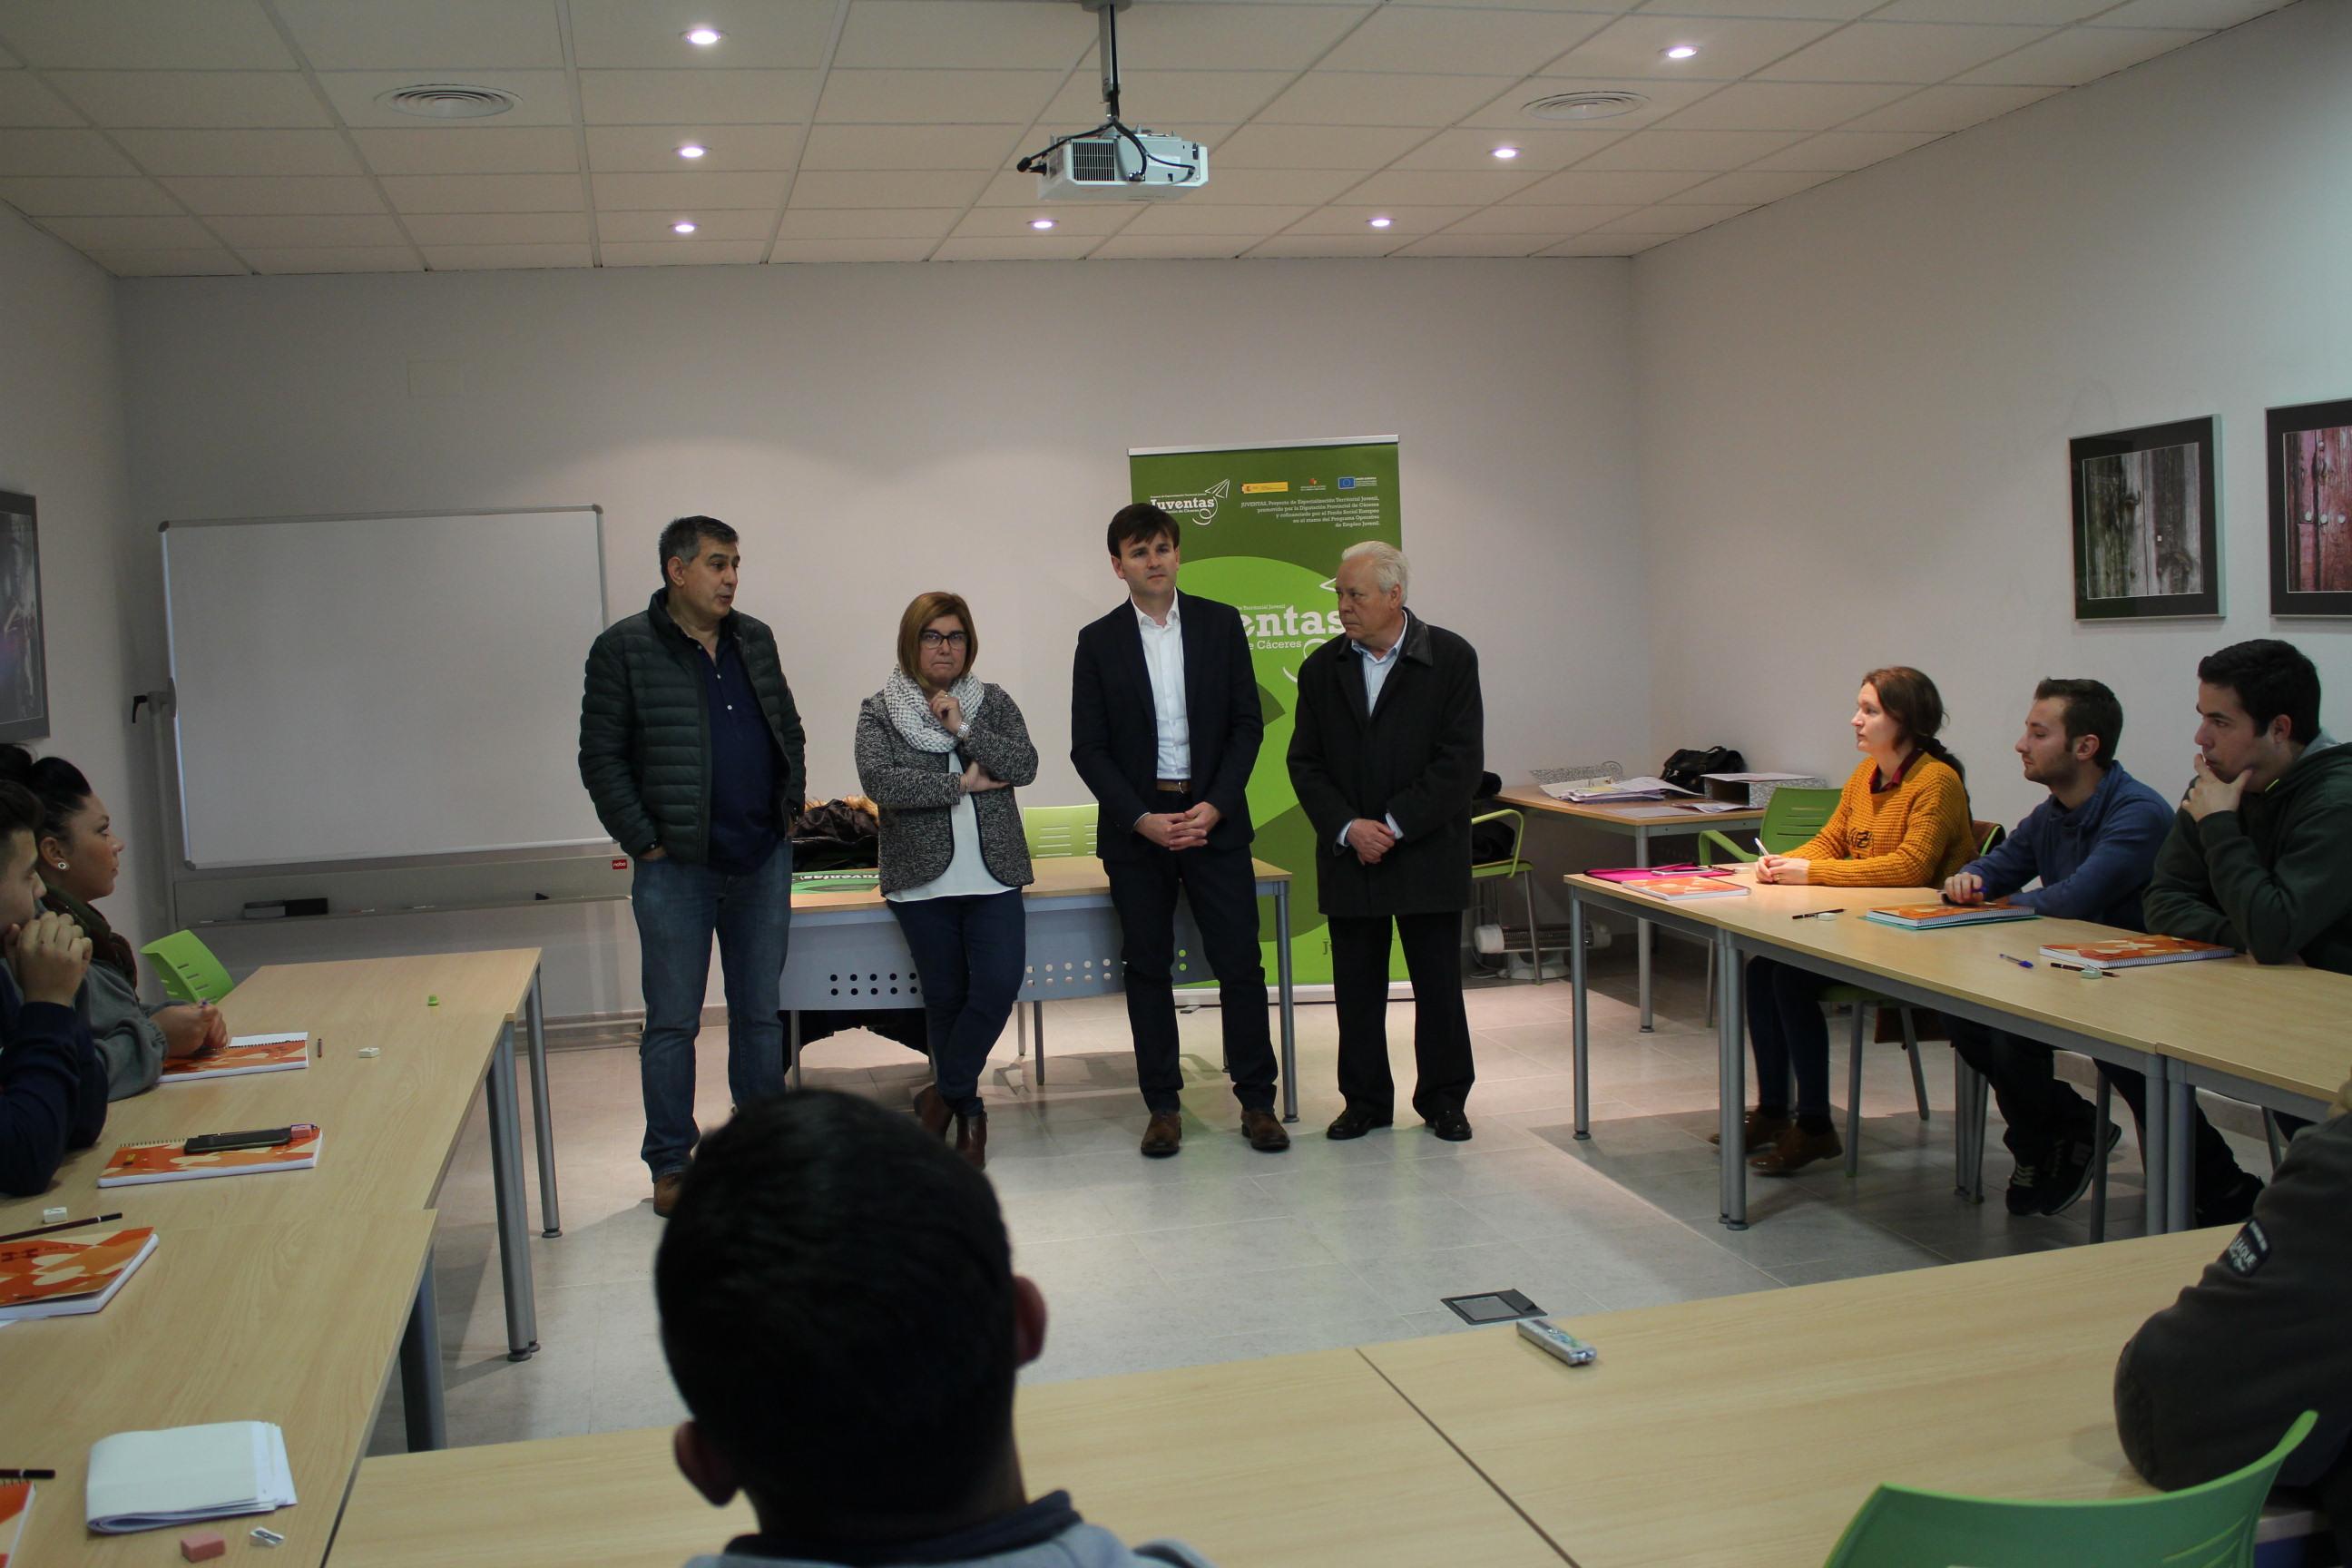 Juventas_Apertura_Curso (1)